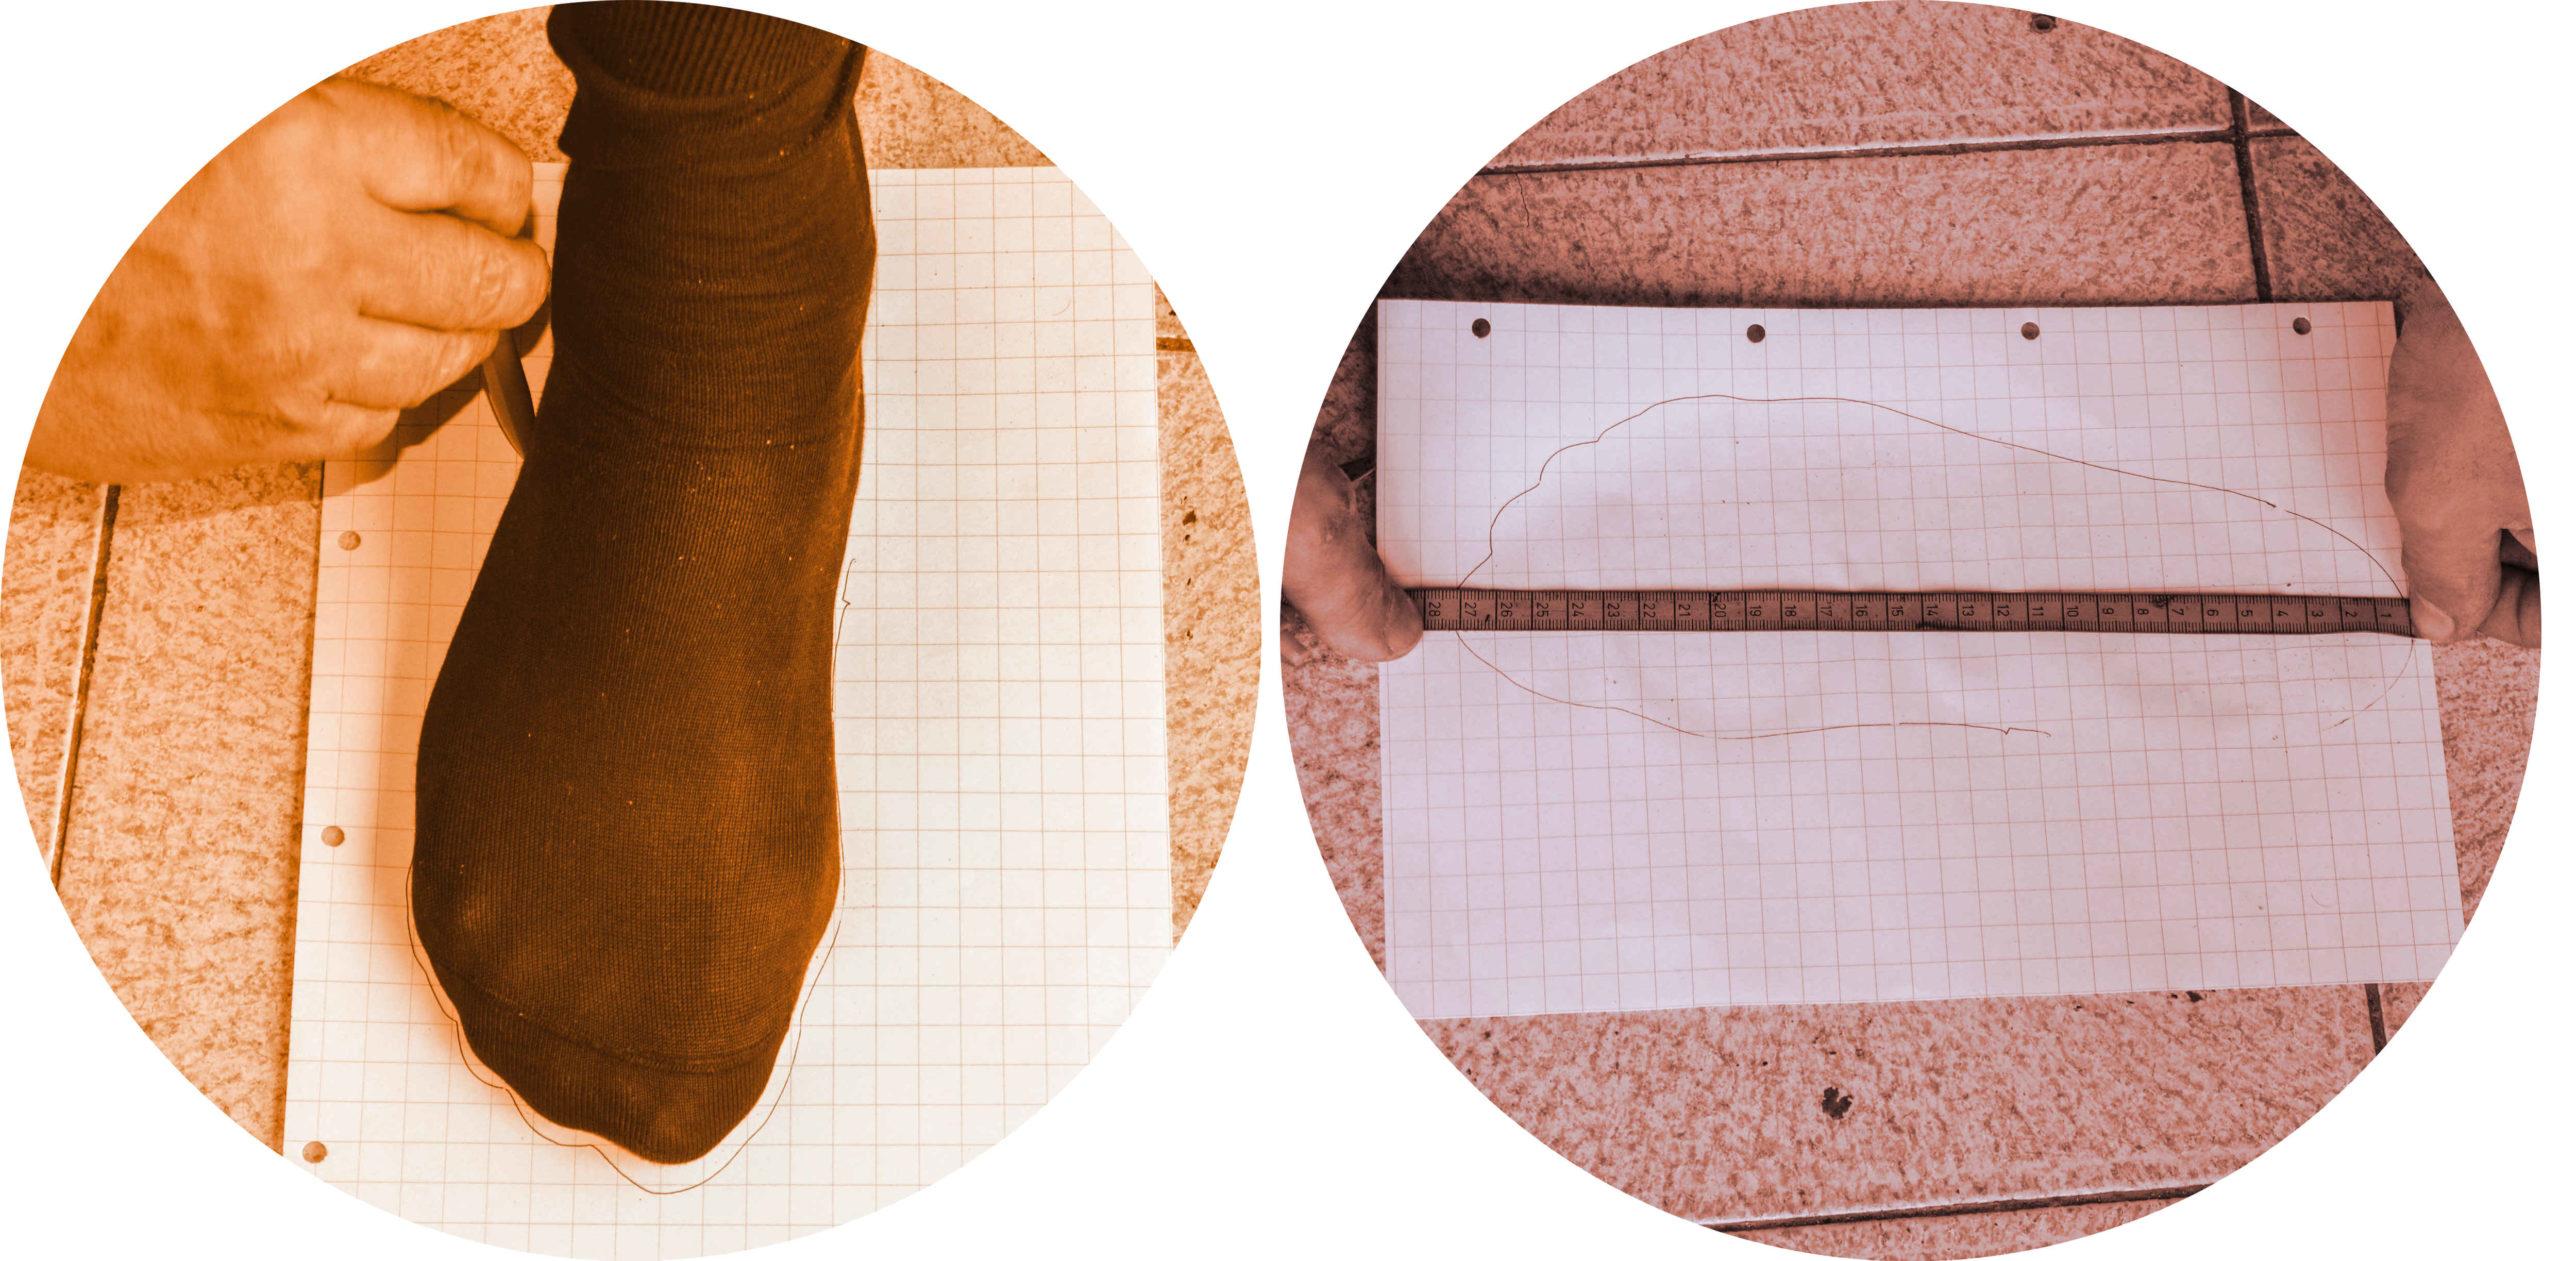 Procedura misure scarpe